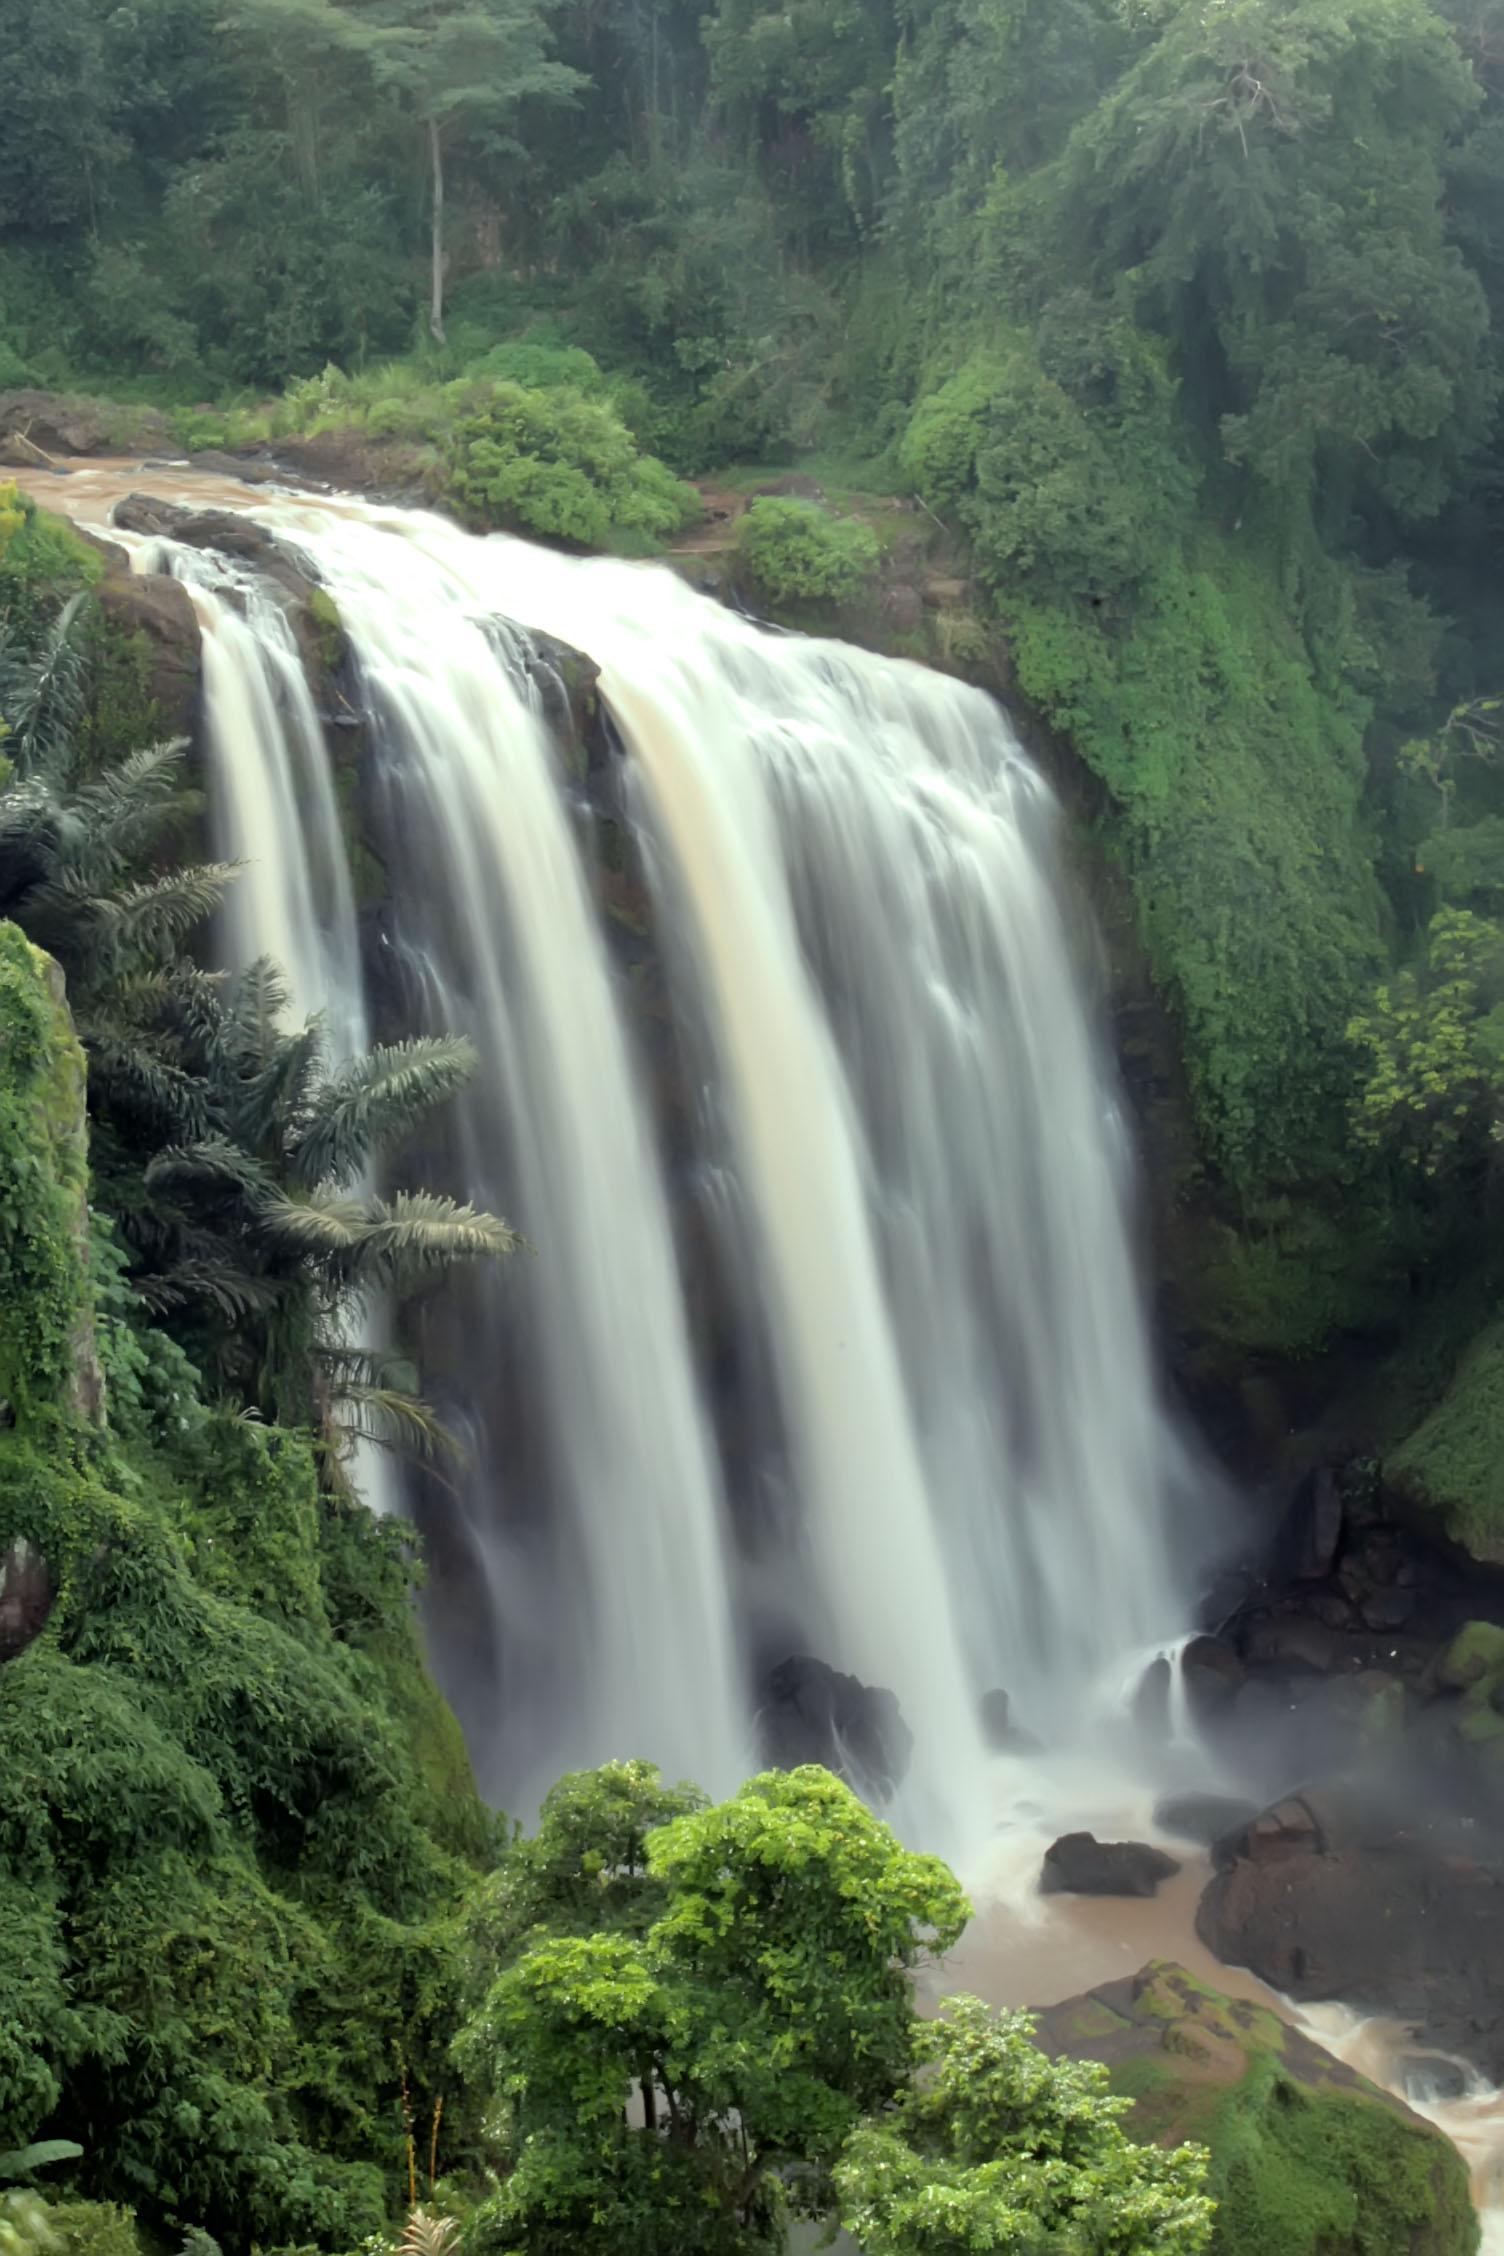 Air Terjun Curug Sewu Bayat Kab Gunungkidul